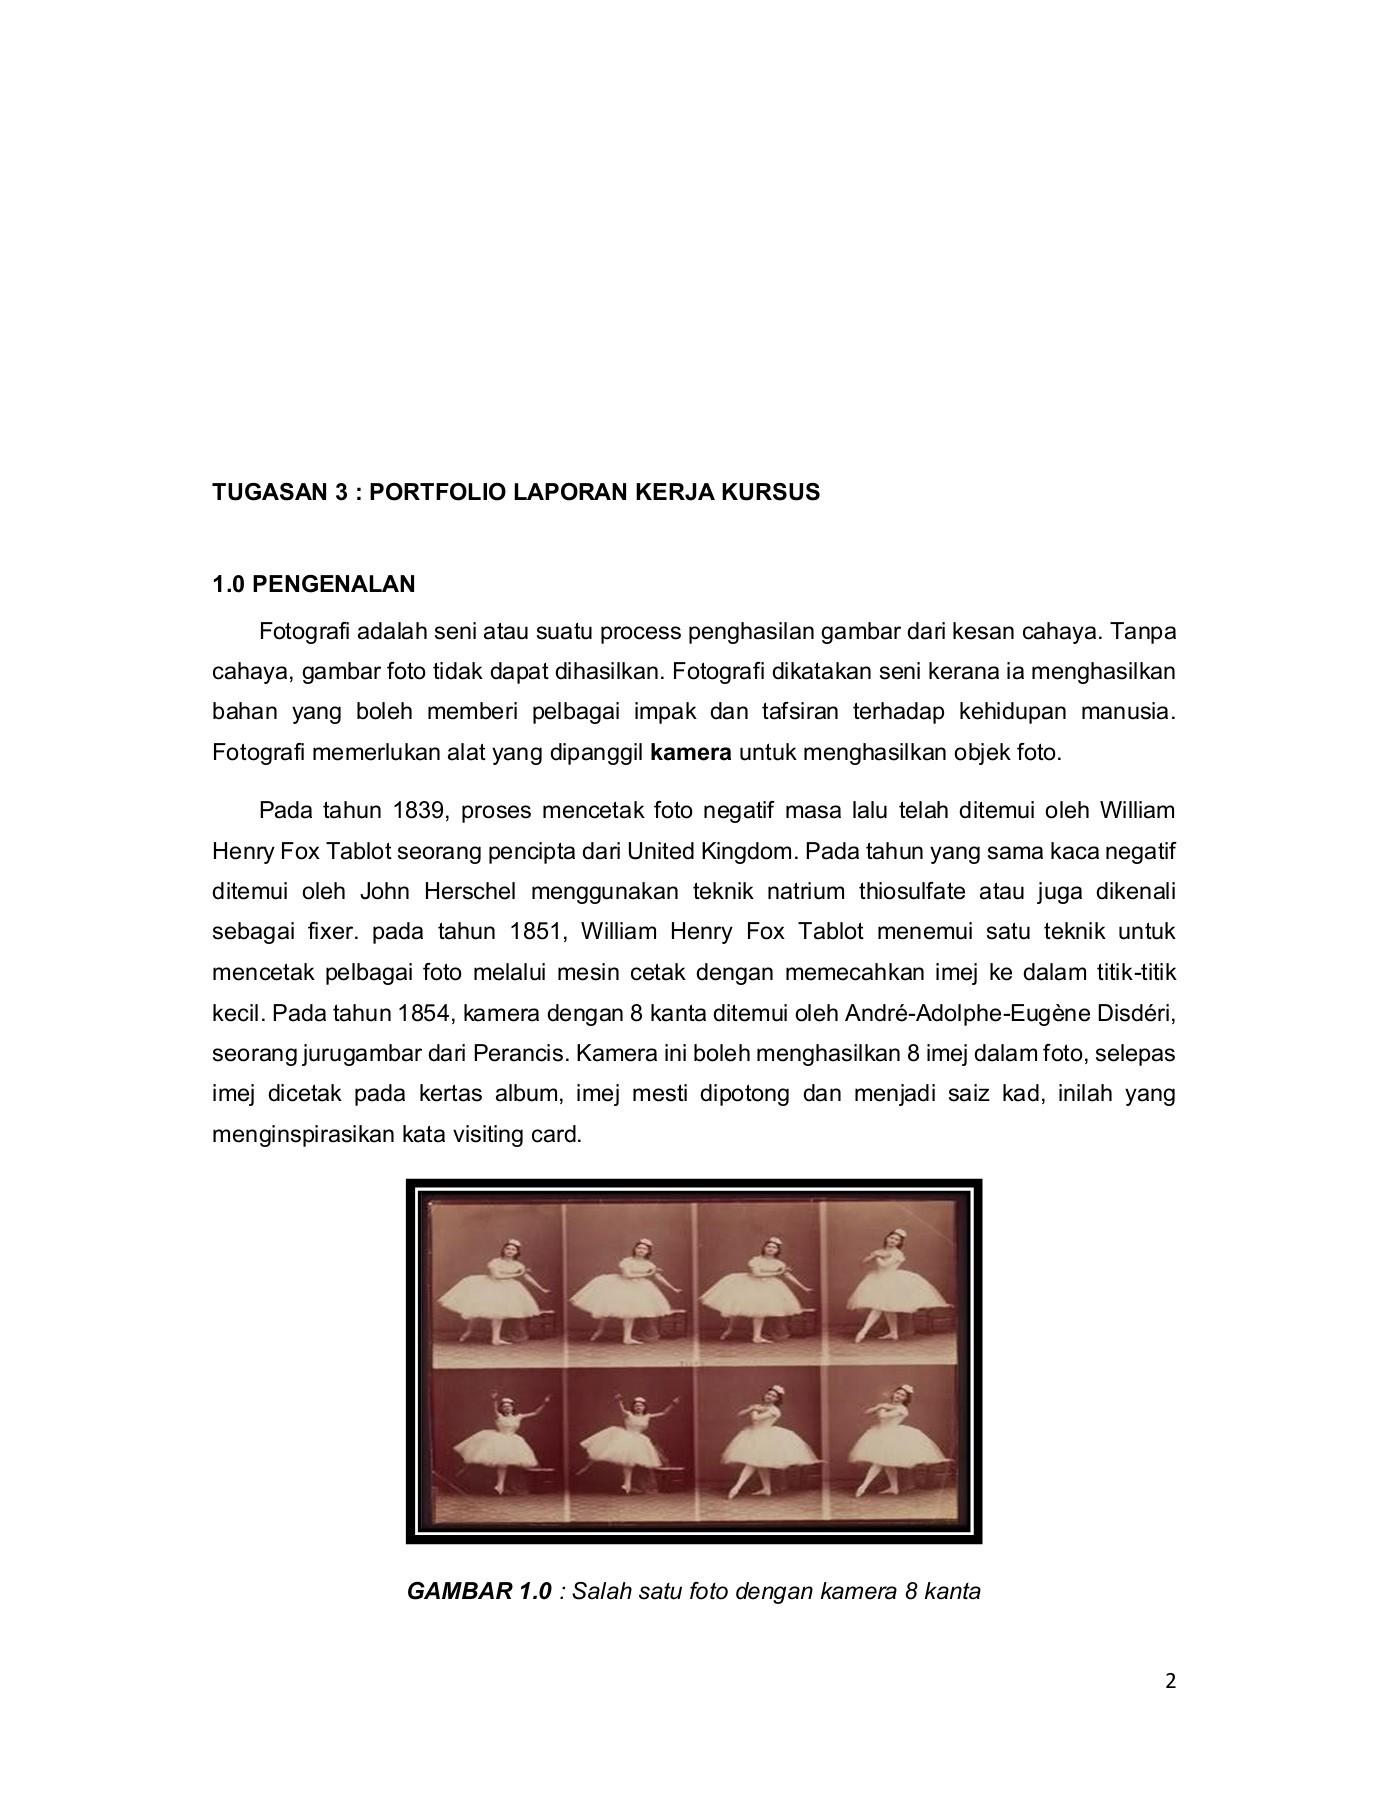 TUGASAN 3 Flip Book Pages 1 50